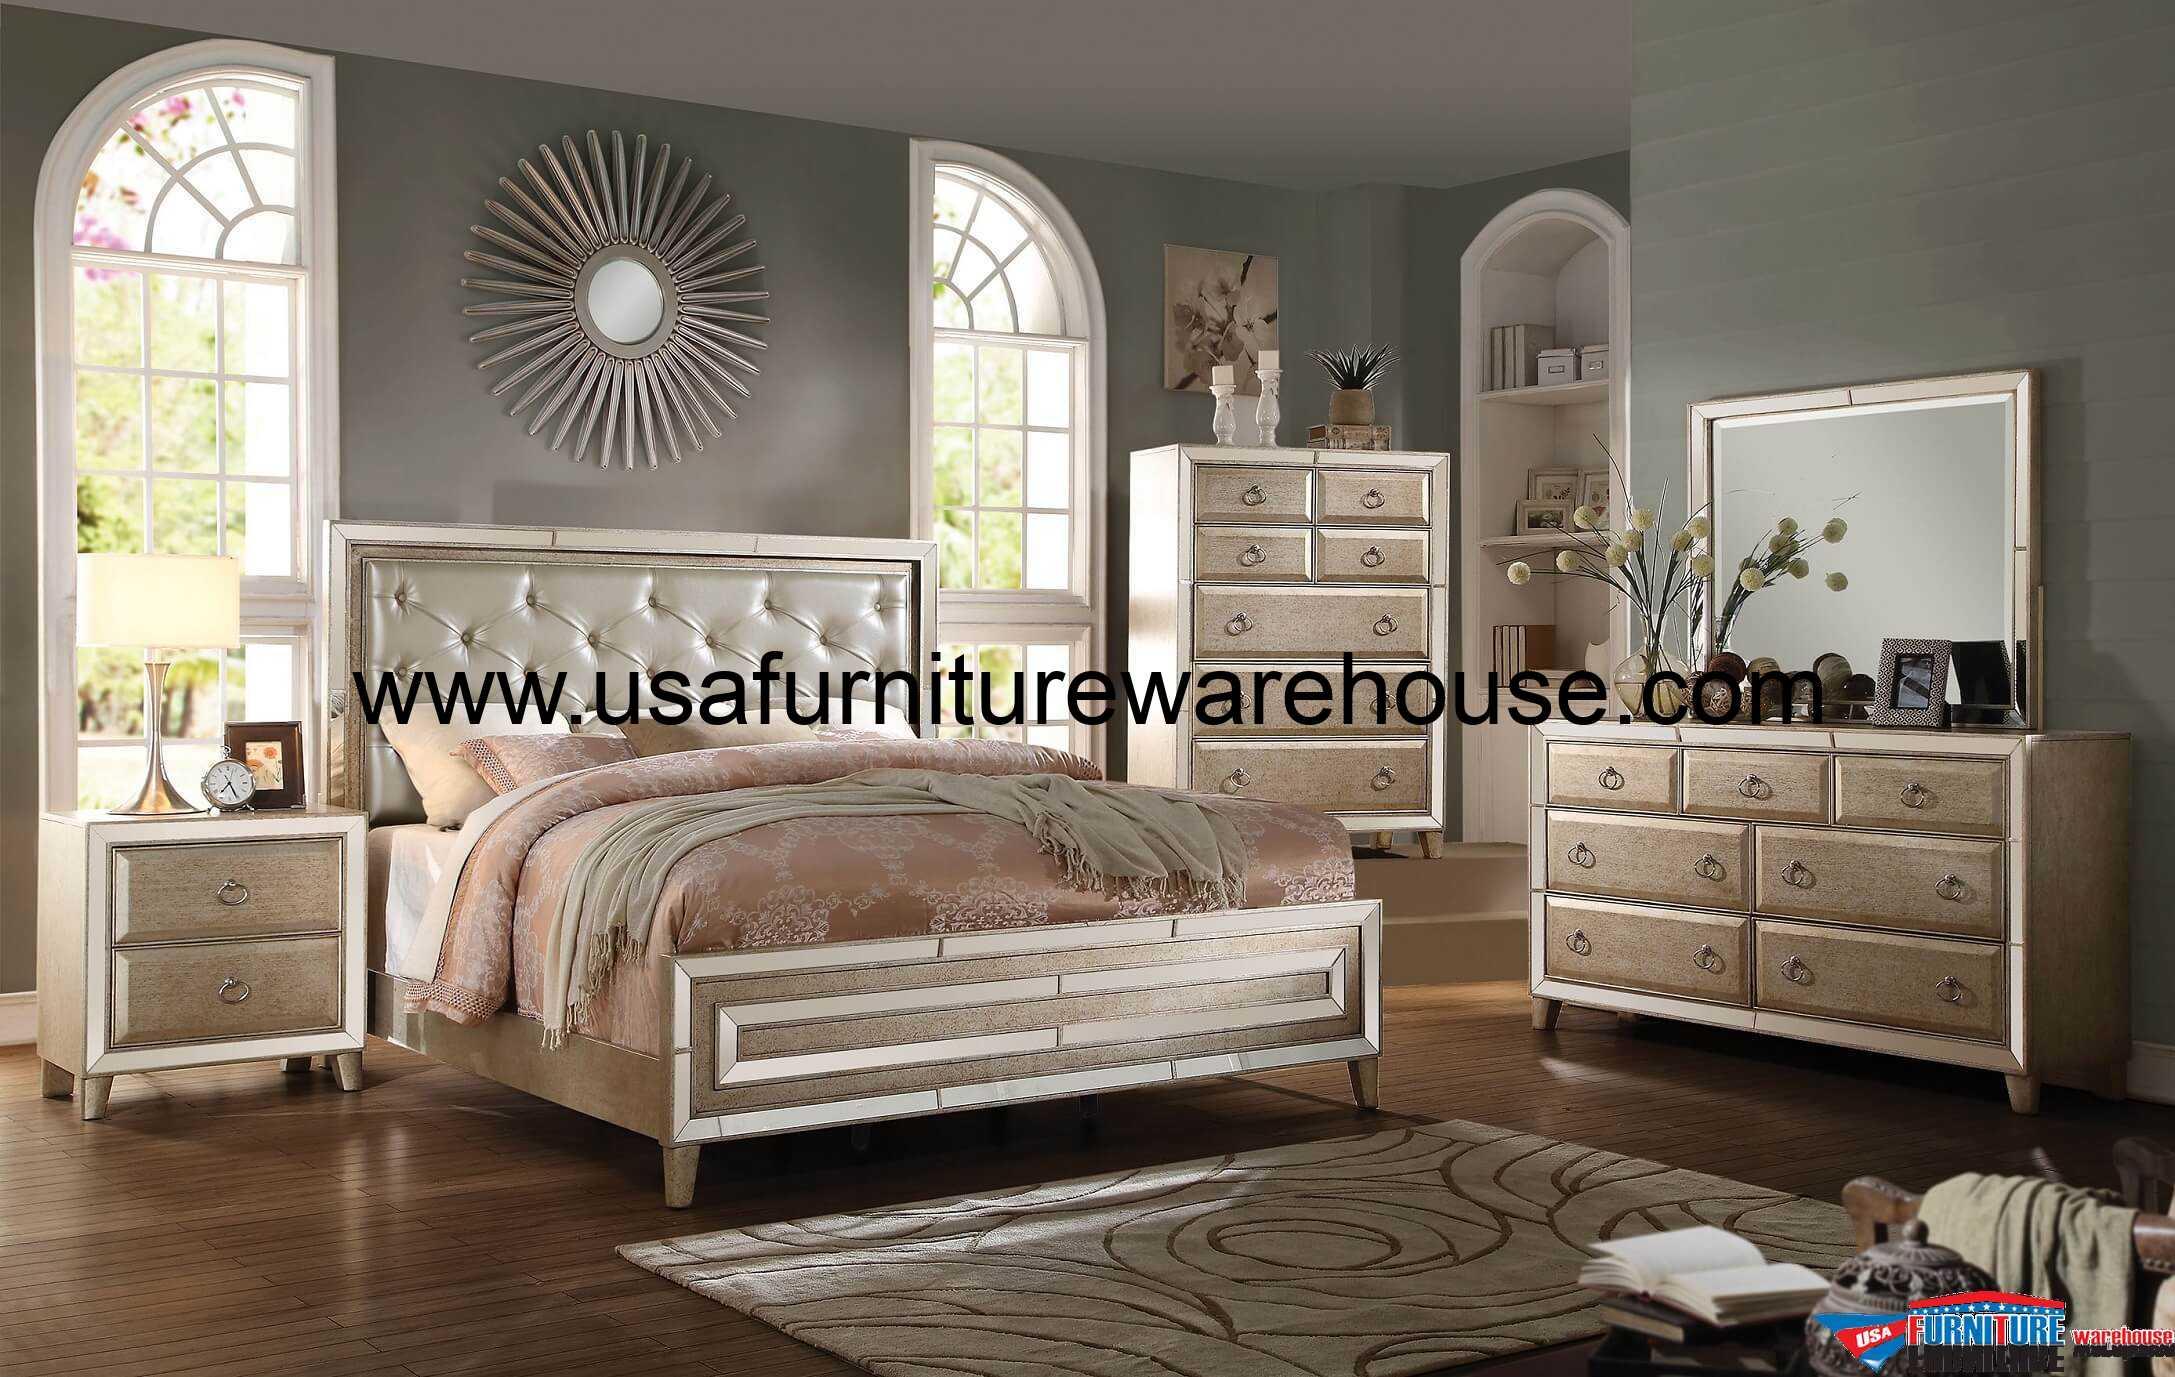 4 Piece Acme Voeville Antique White Mirrored bedroom Set